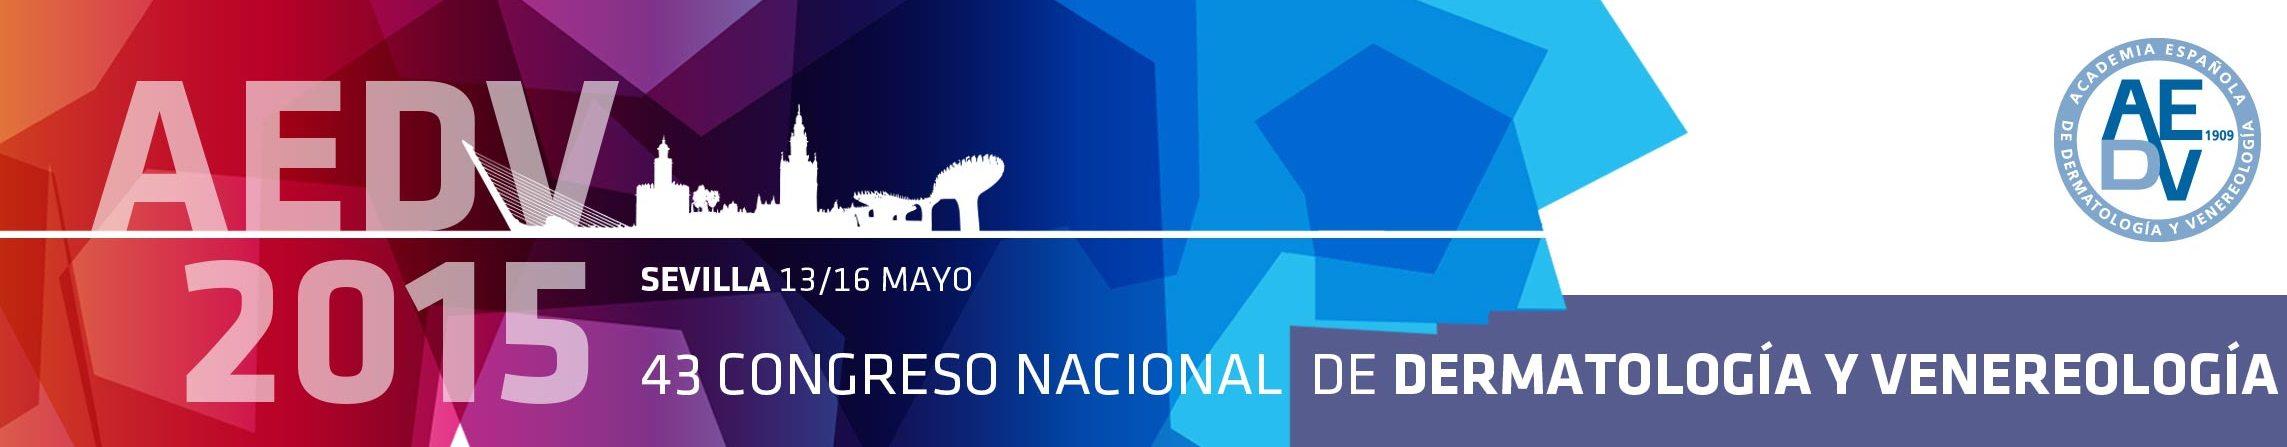 congreso nacional de dermatologia 2015